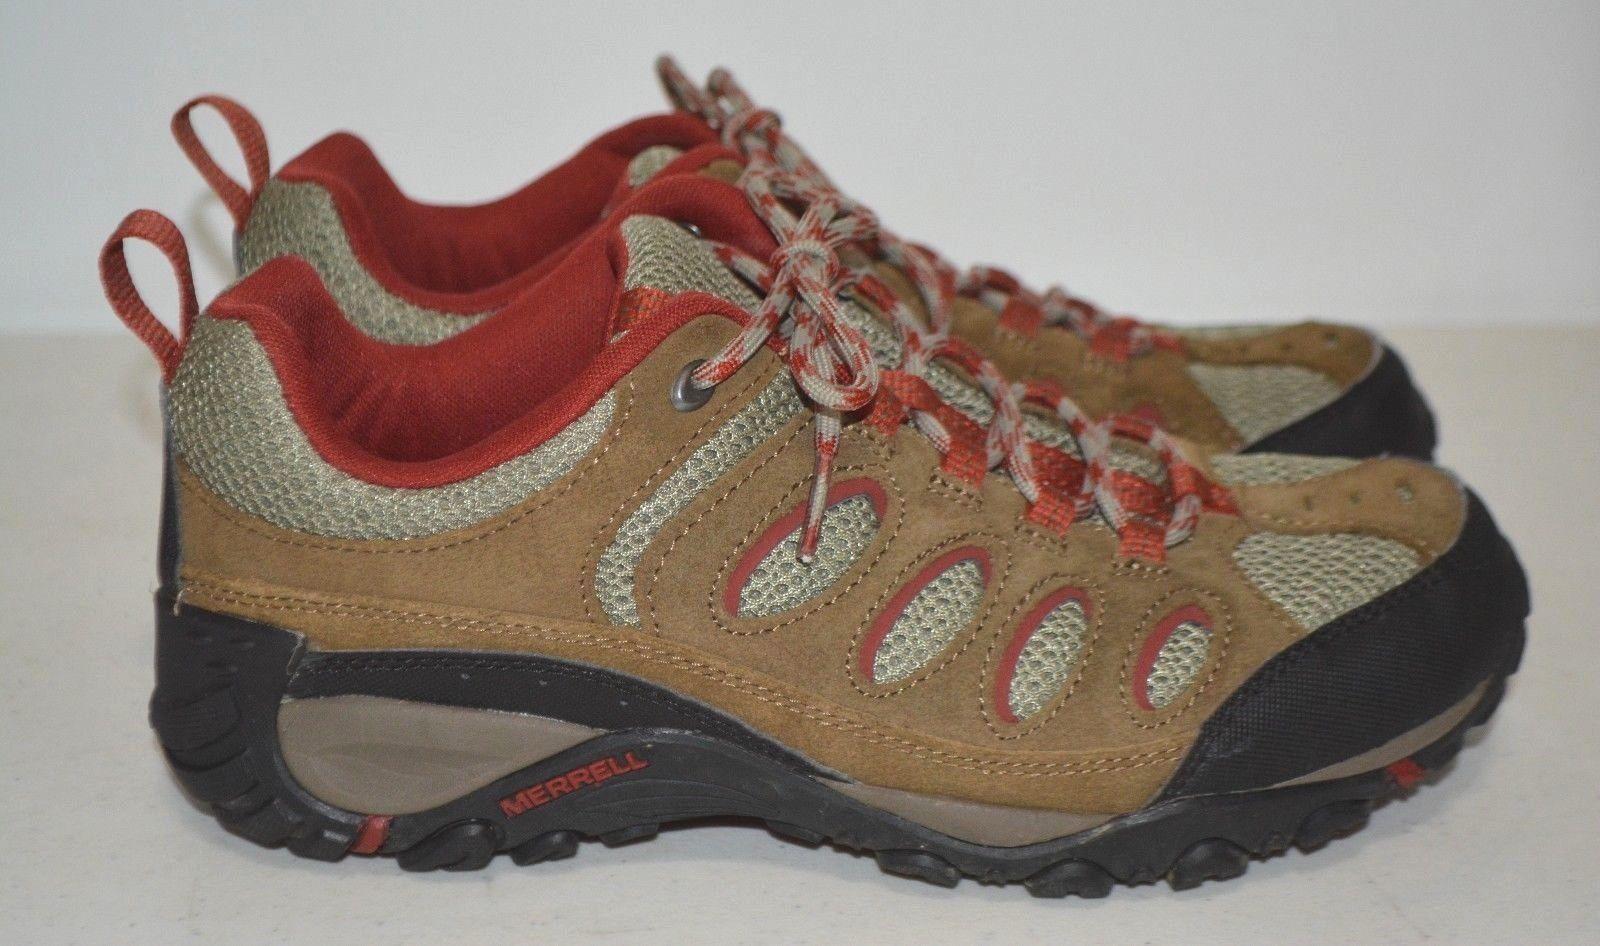 f6638d3d70b Men Merrell KANGAROO Hiking Trail Shoes and 50 similar items